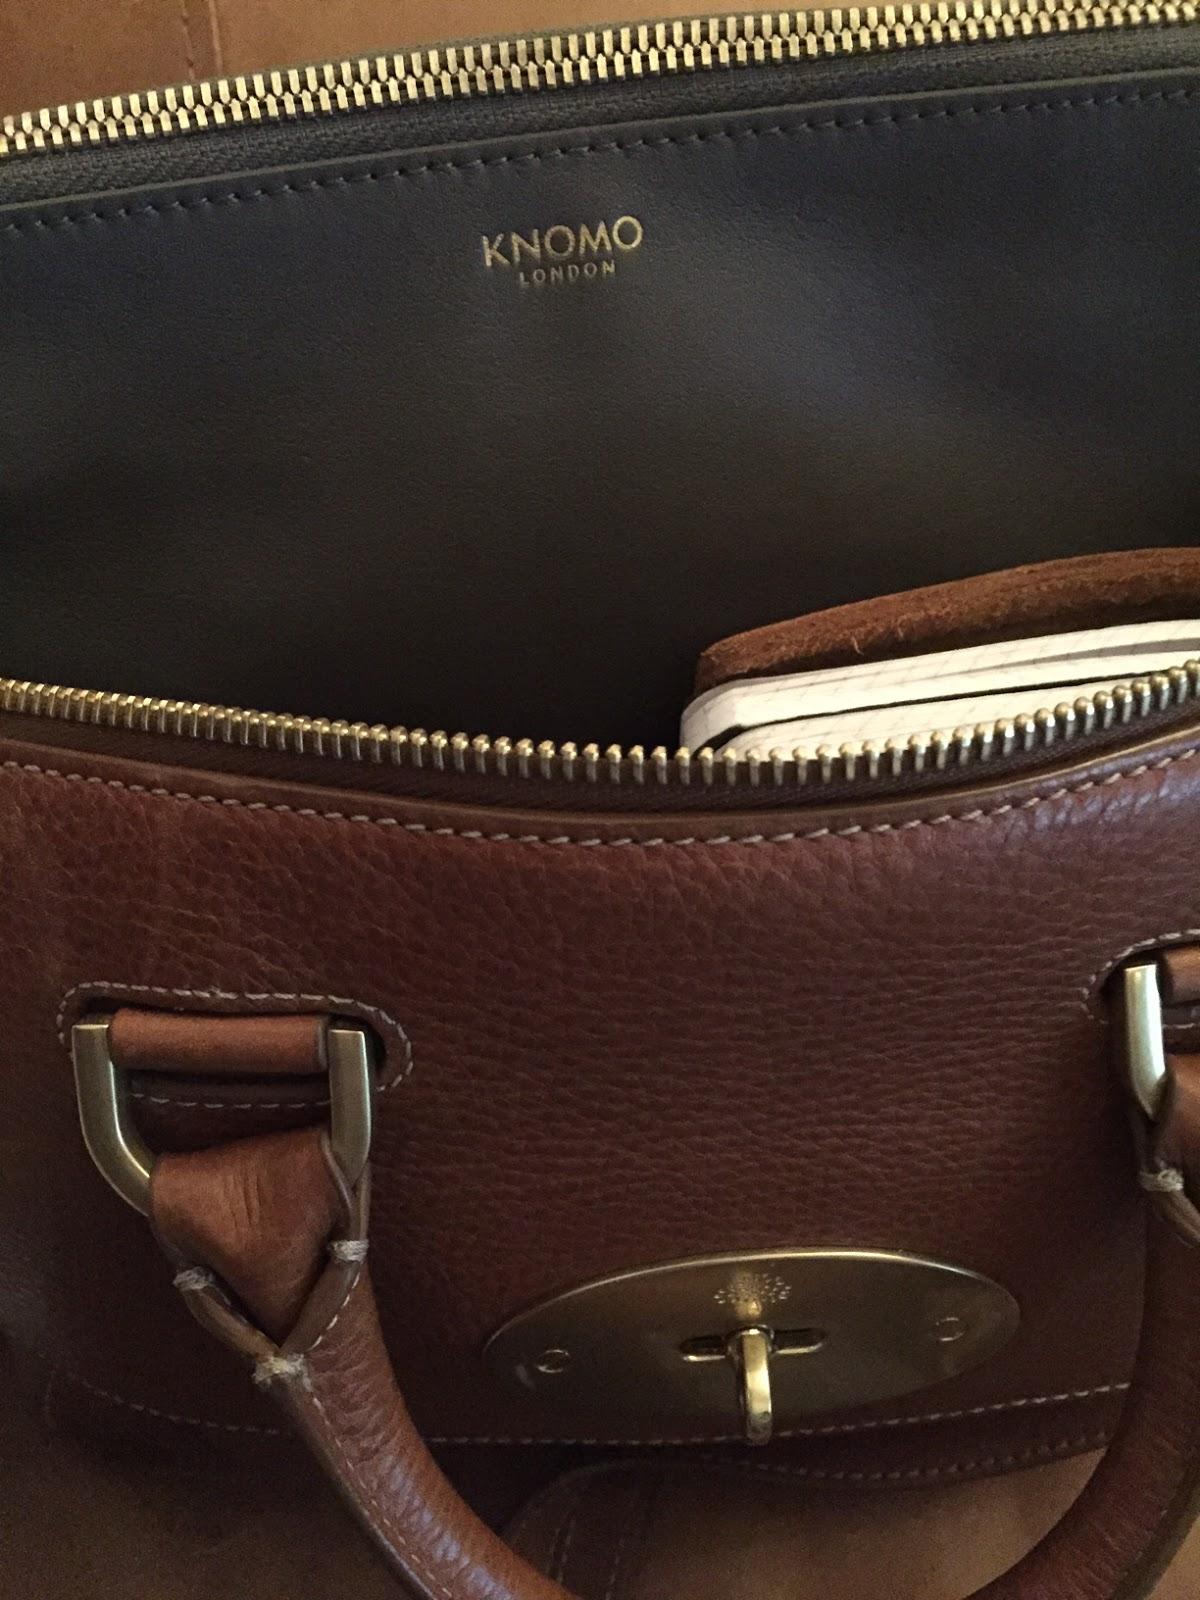 7d3da9c46b Knomo Bond purse andMulberry Small Del Rey